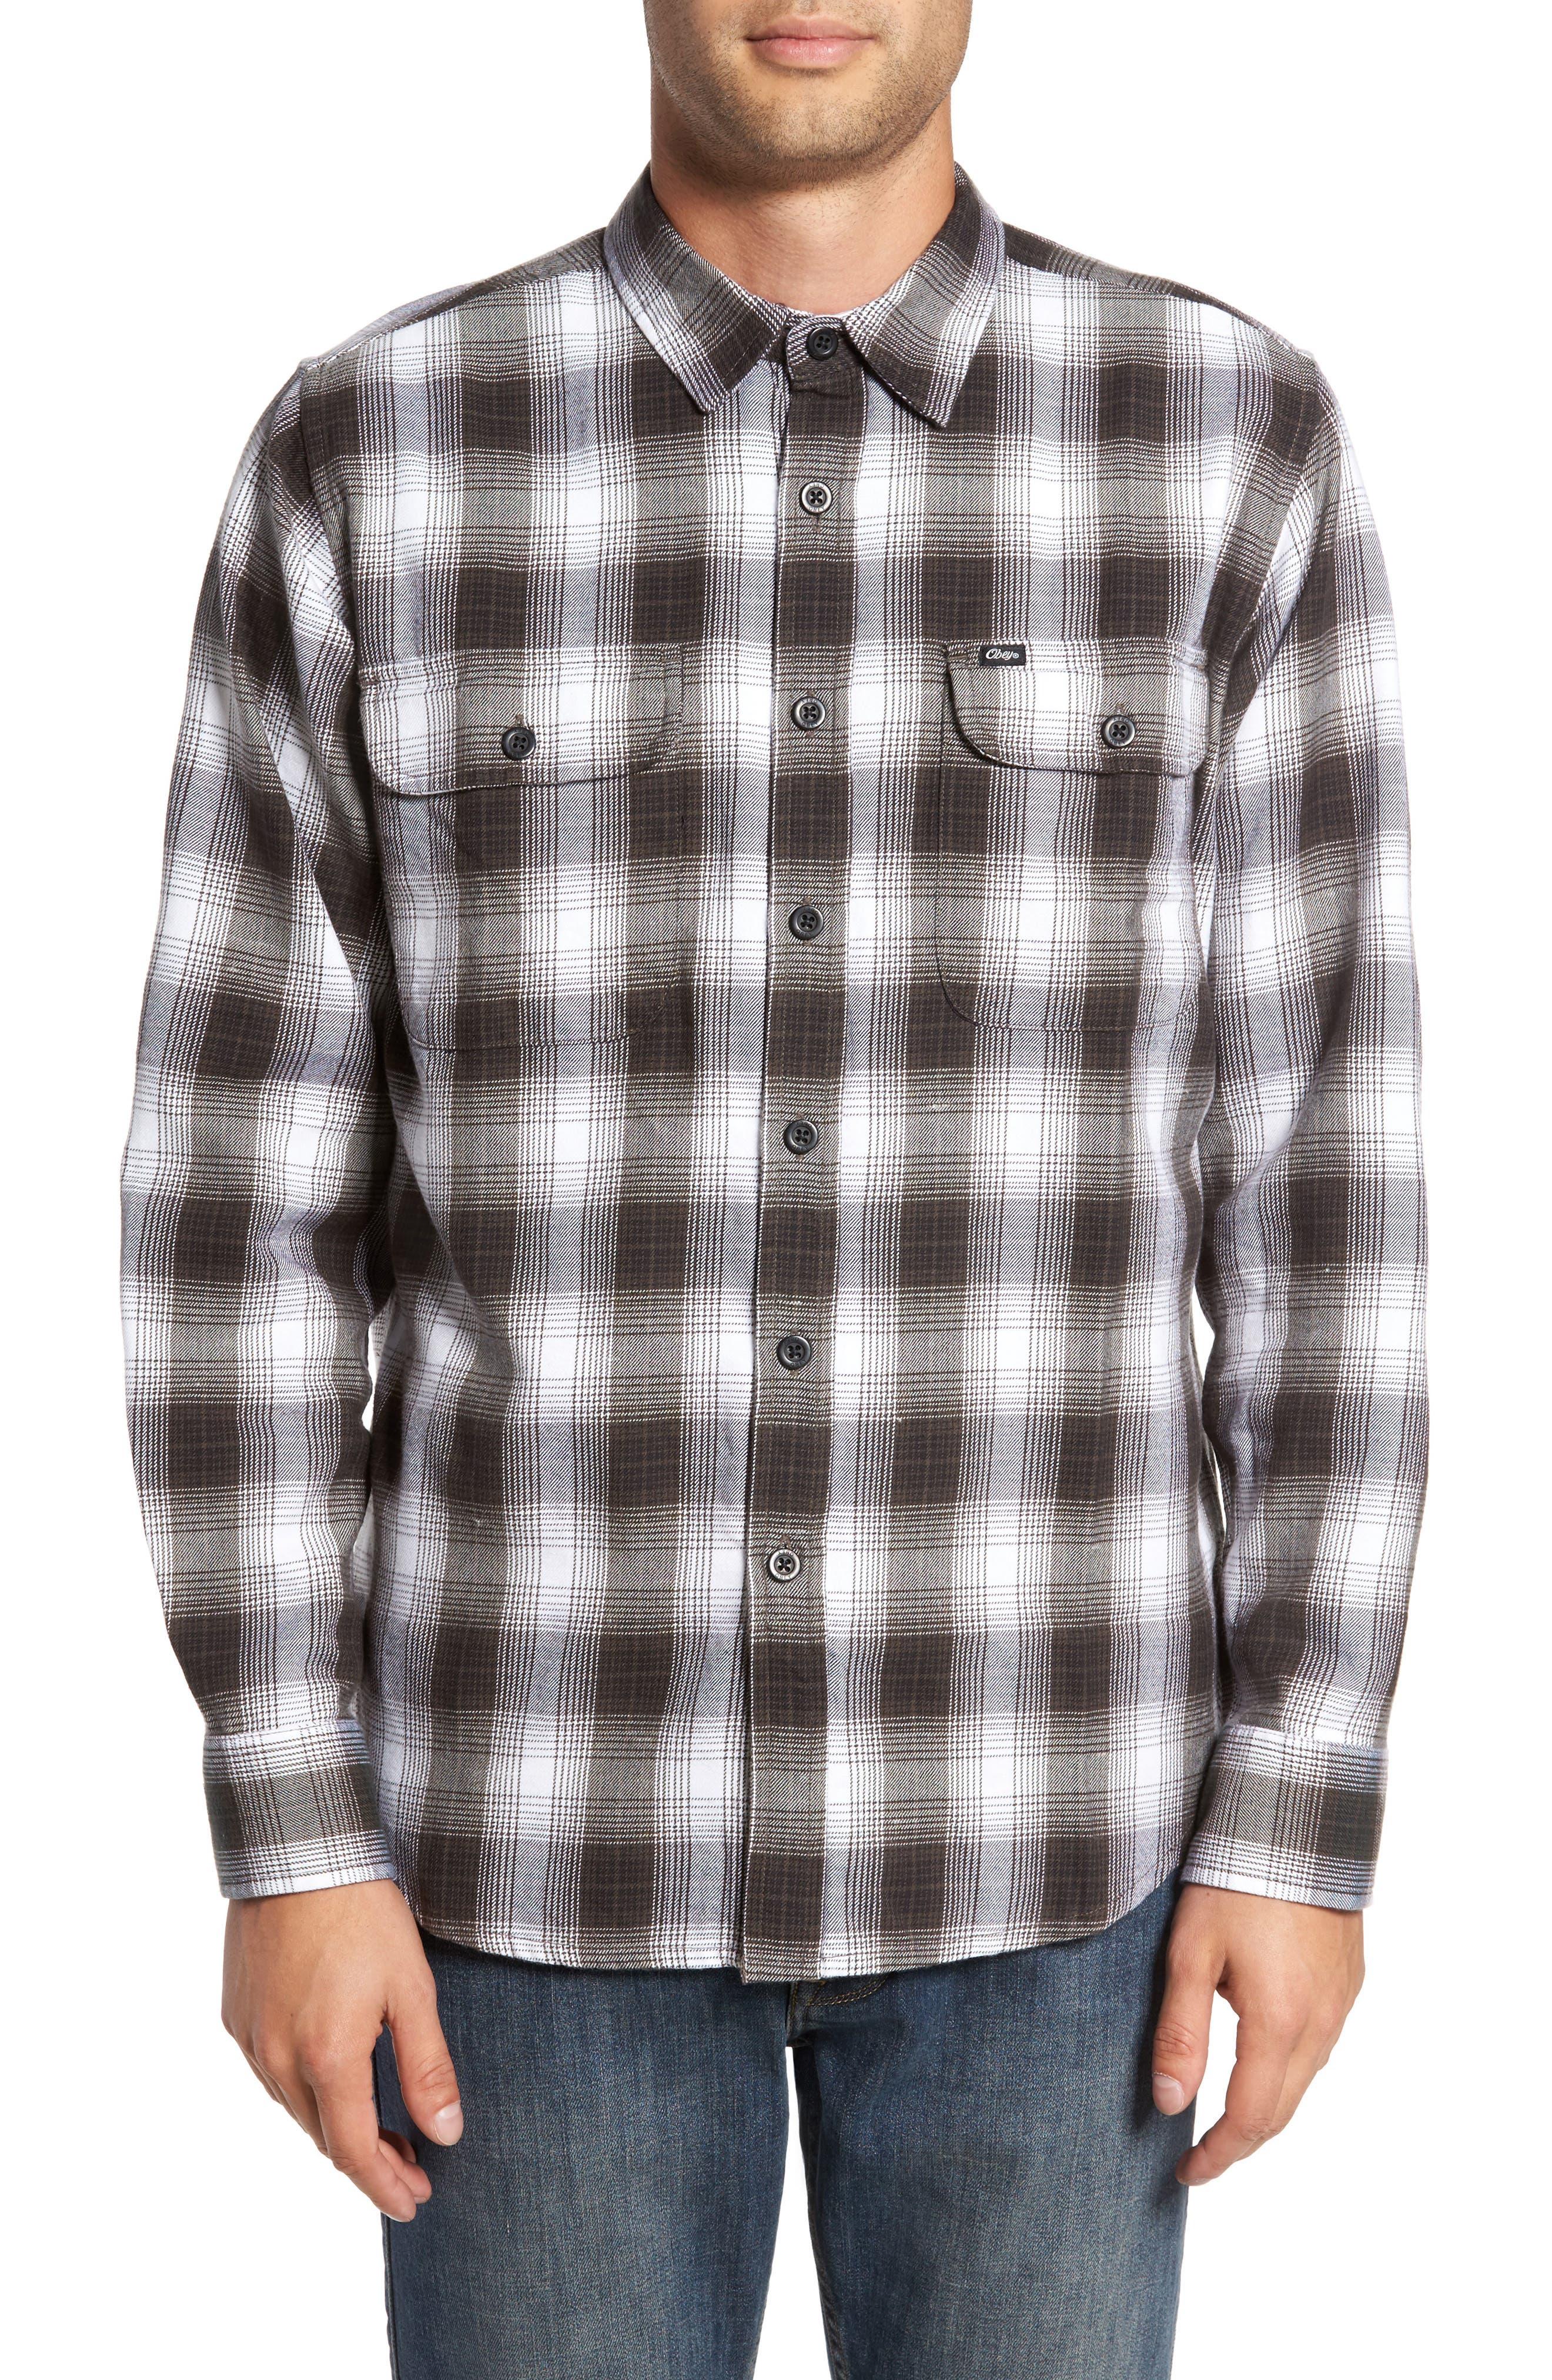 Kemper Plaid Woven Shirt,                             Main thumbnail 1, color,                             002